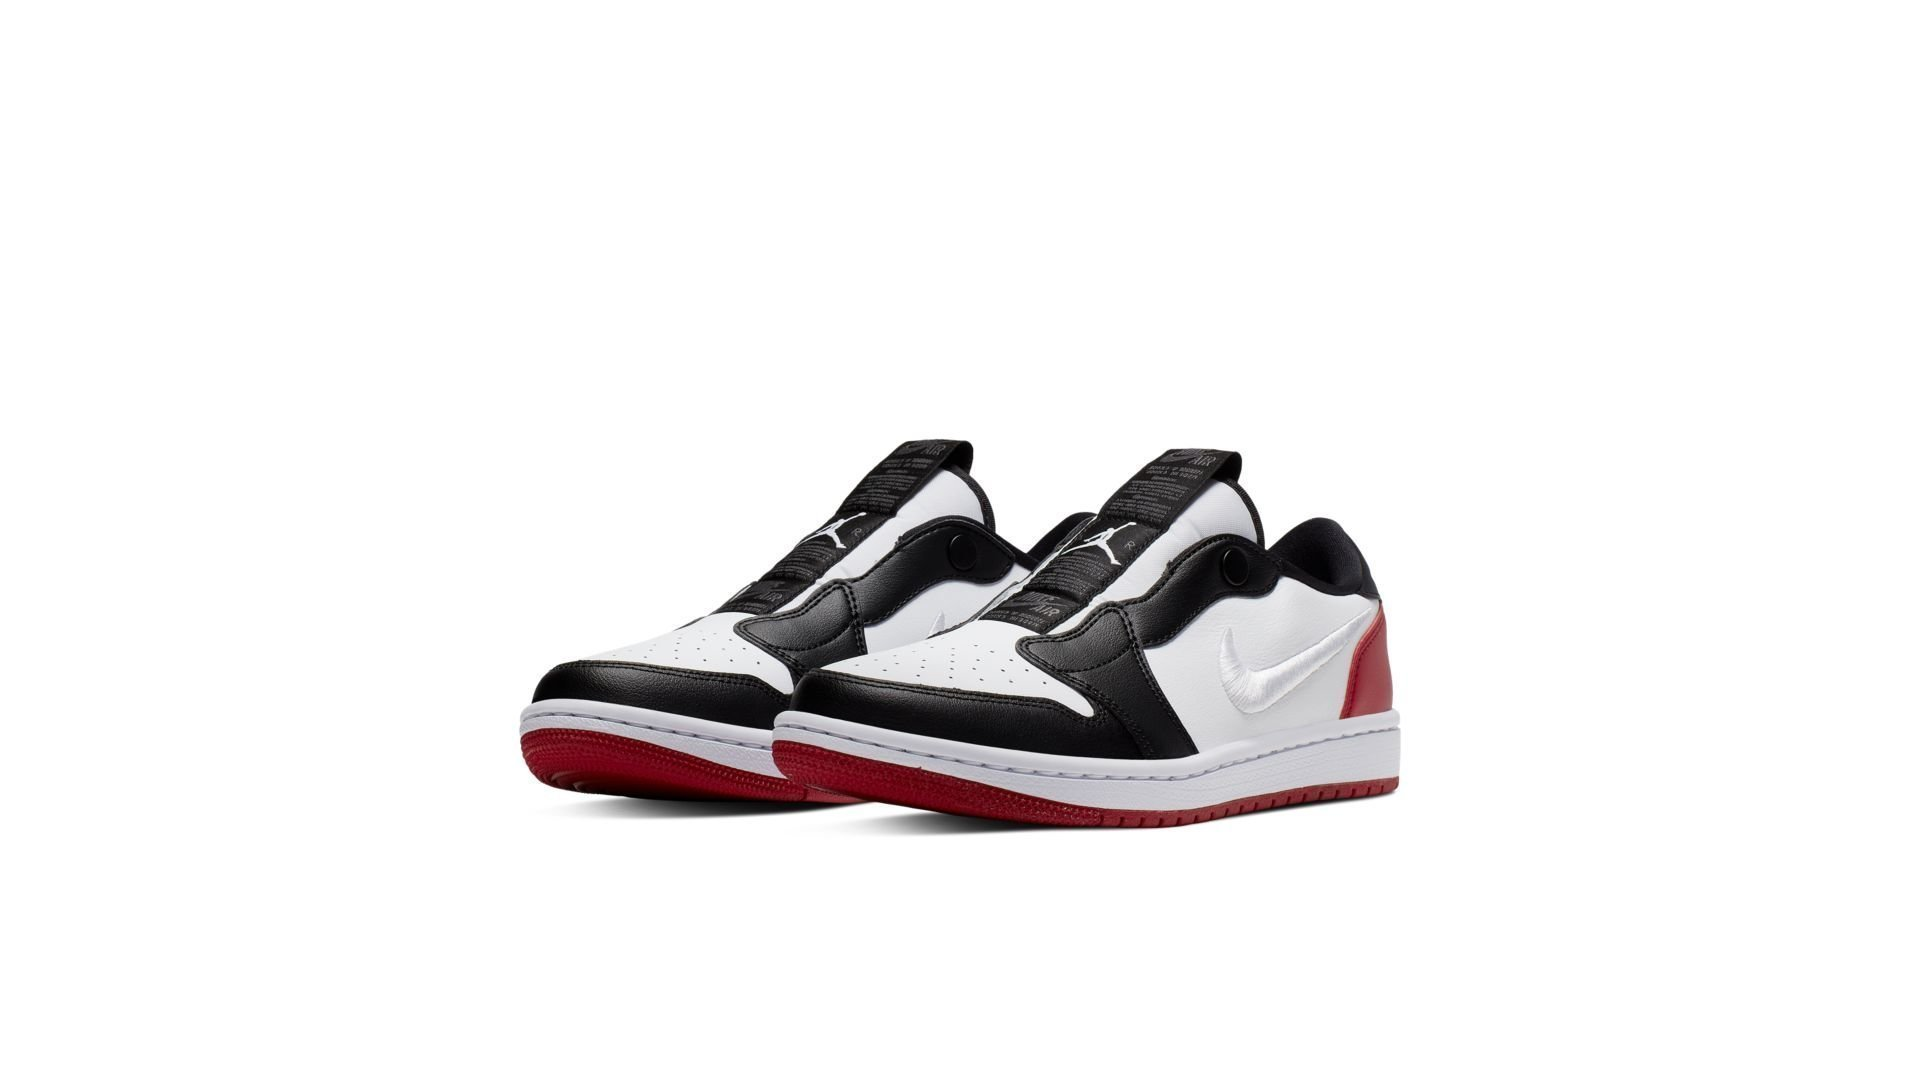 Jordan 1 Retro Low Slip Black Toe (W) (AV3918-102)